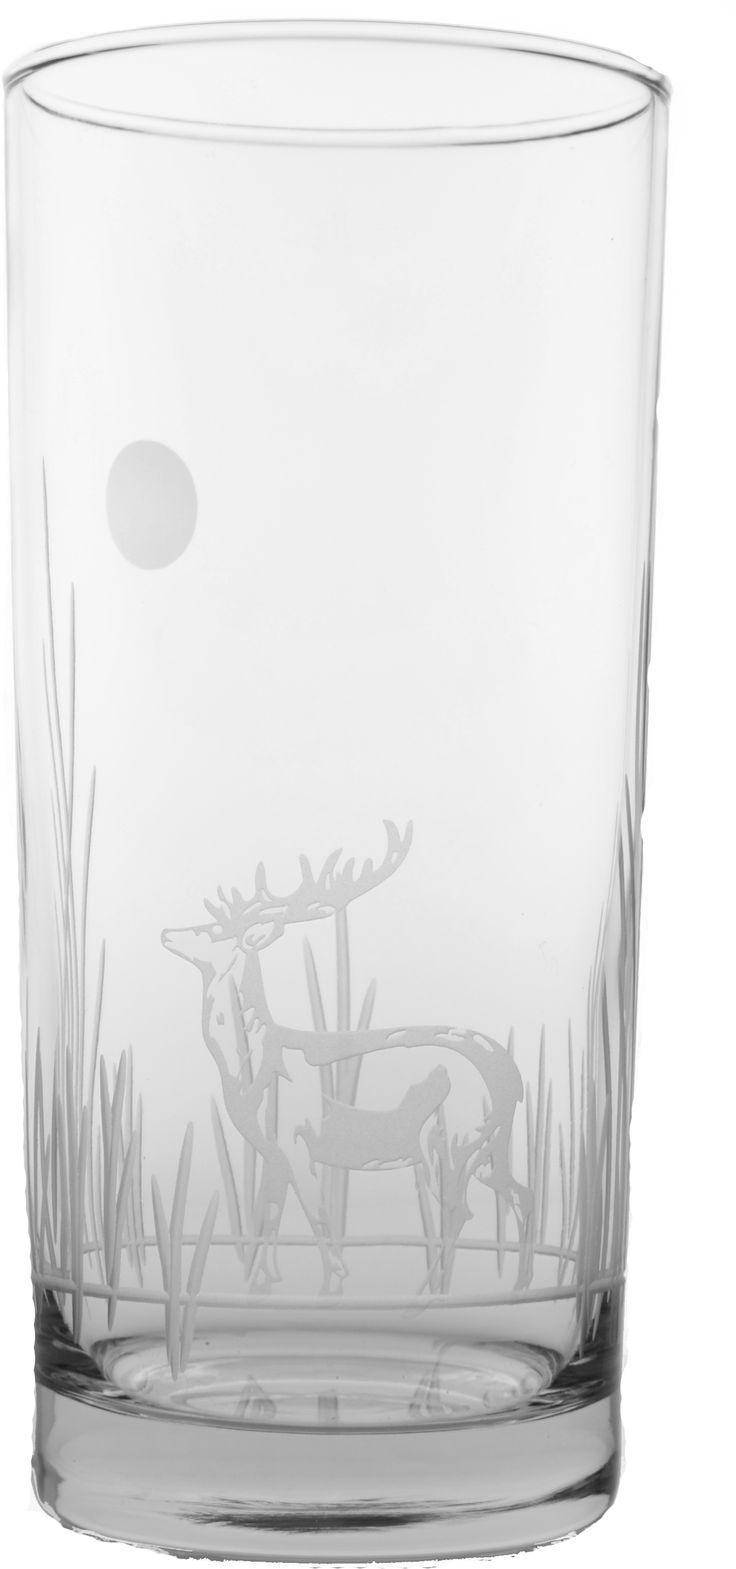 Deer Cooler Glasses Set of 4 15oz - $44.95 #Glassware, #Bar, #Nautical, #Beach, #Tropical, #Bar #deer #decor #kitchen